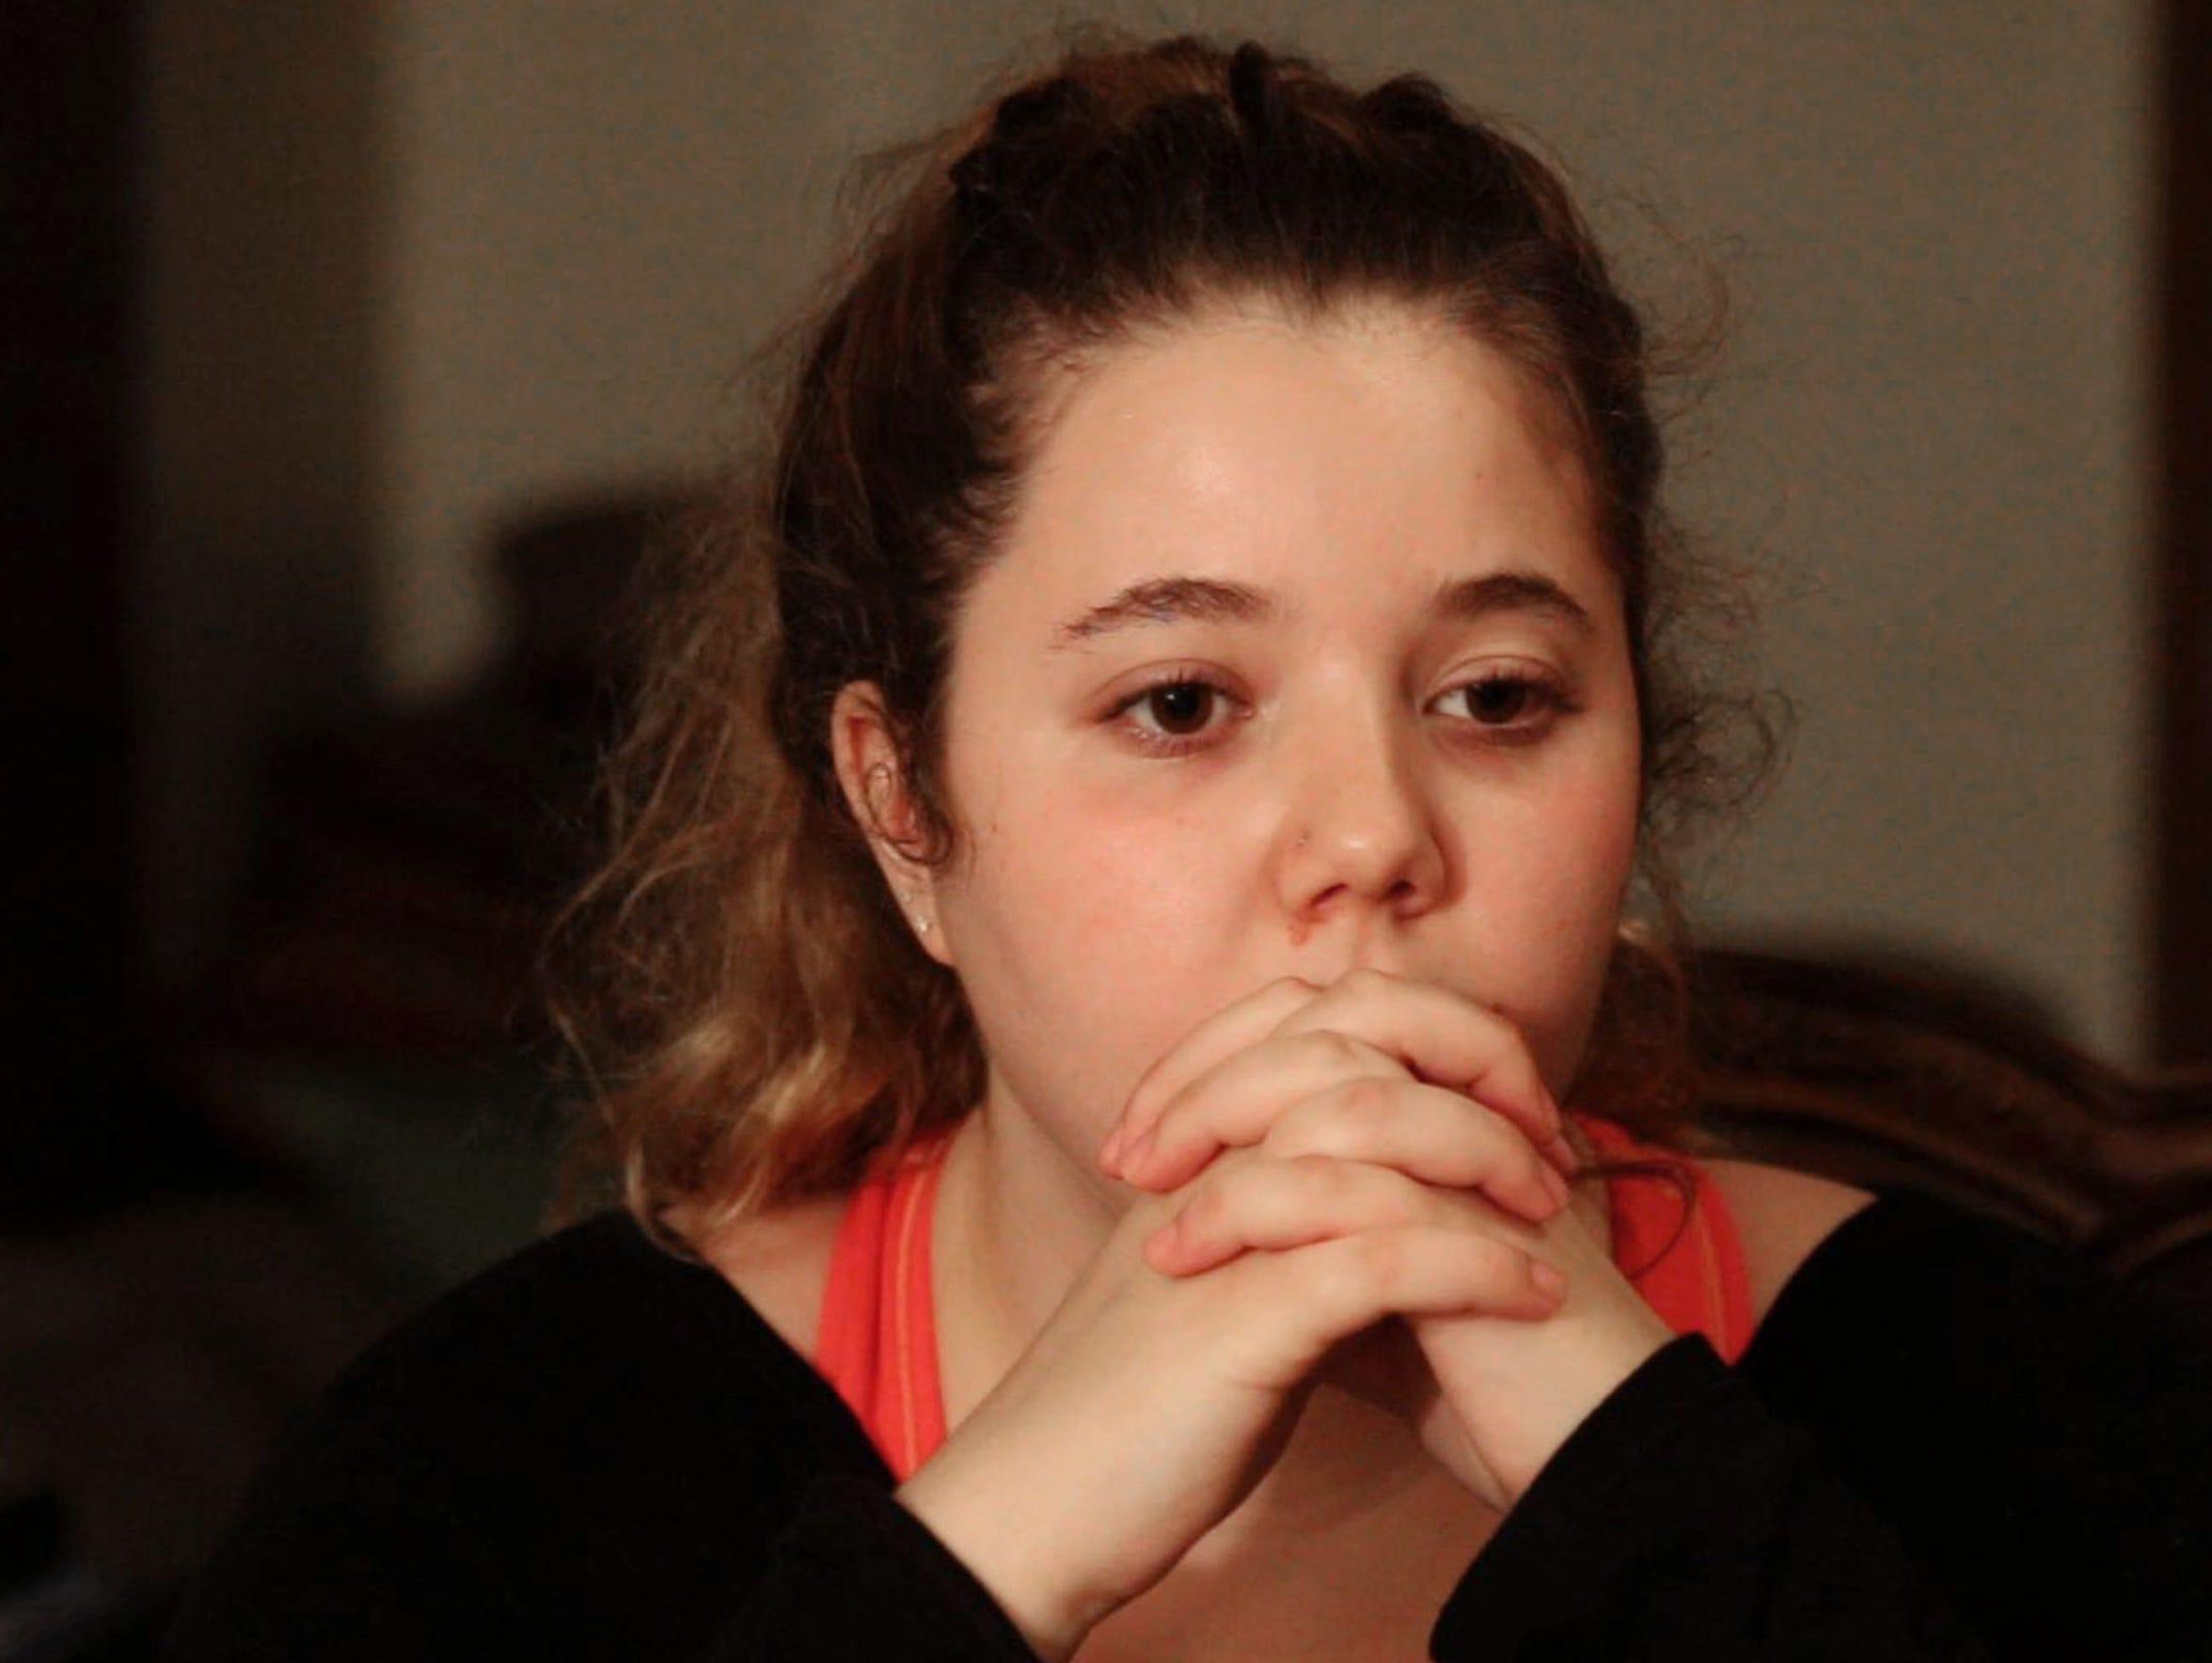 Leonard Boldman's 19-year-old daughter Carly Boldman